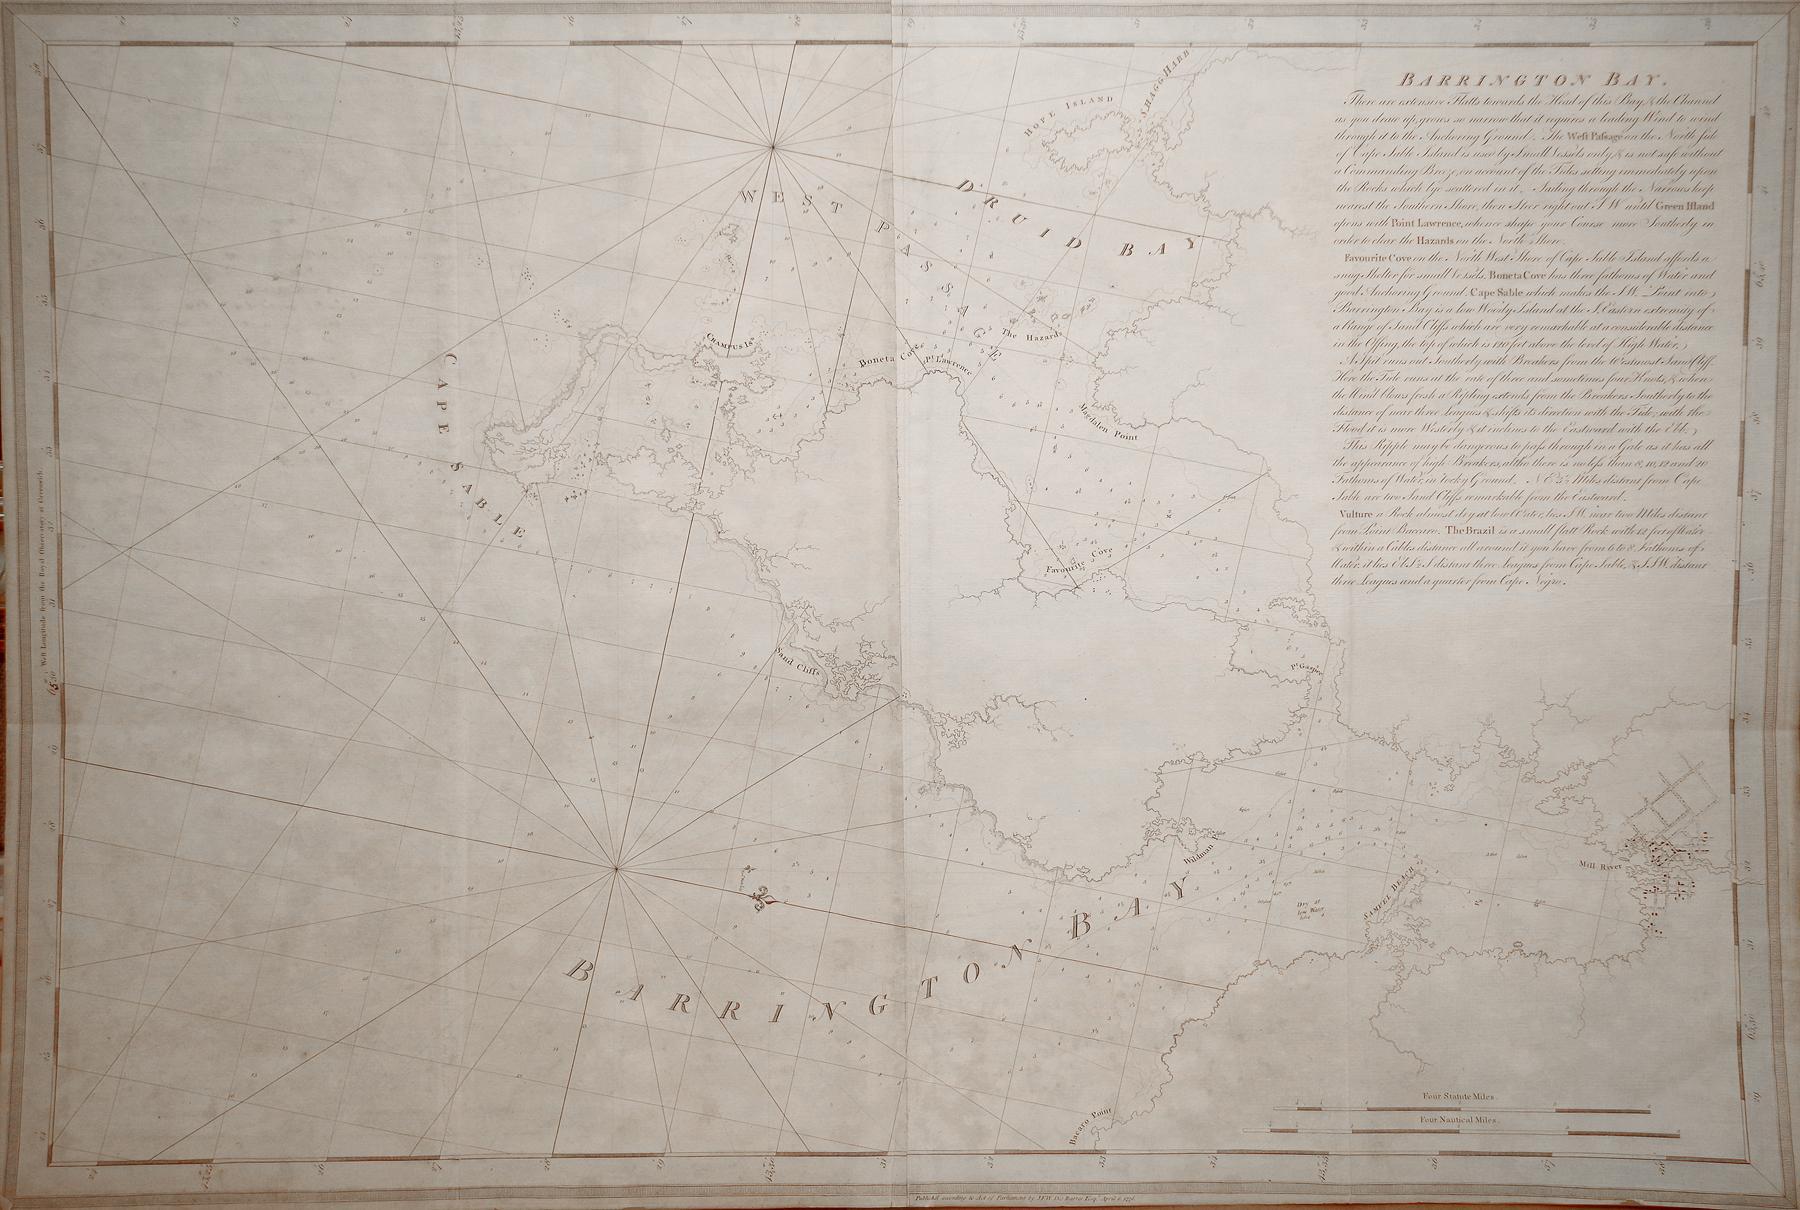 Barrington Bay: Joseph Frederick Willet Des Barres